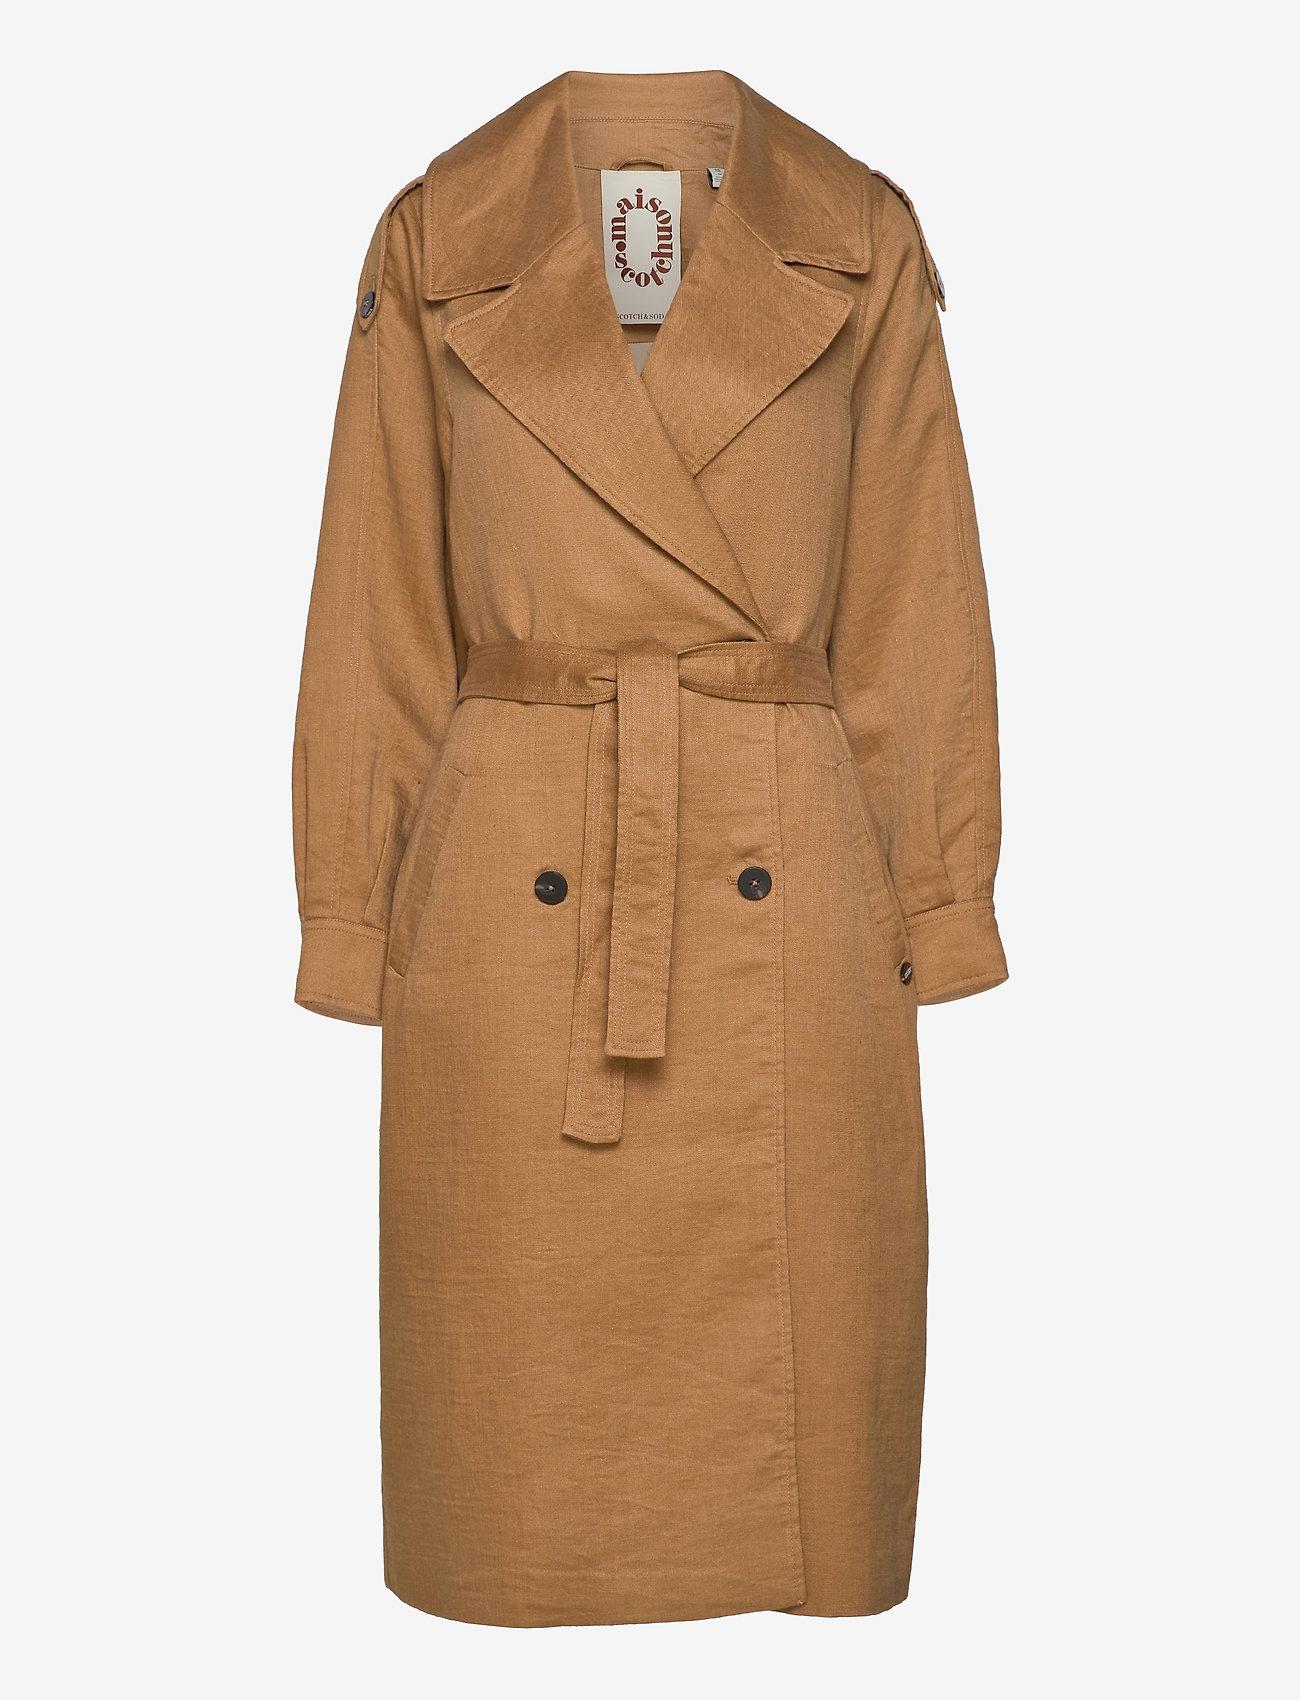 Scotch & Soda - Longer length trench coat - trenchcoats - sand - 0